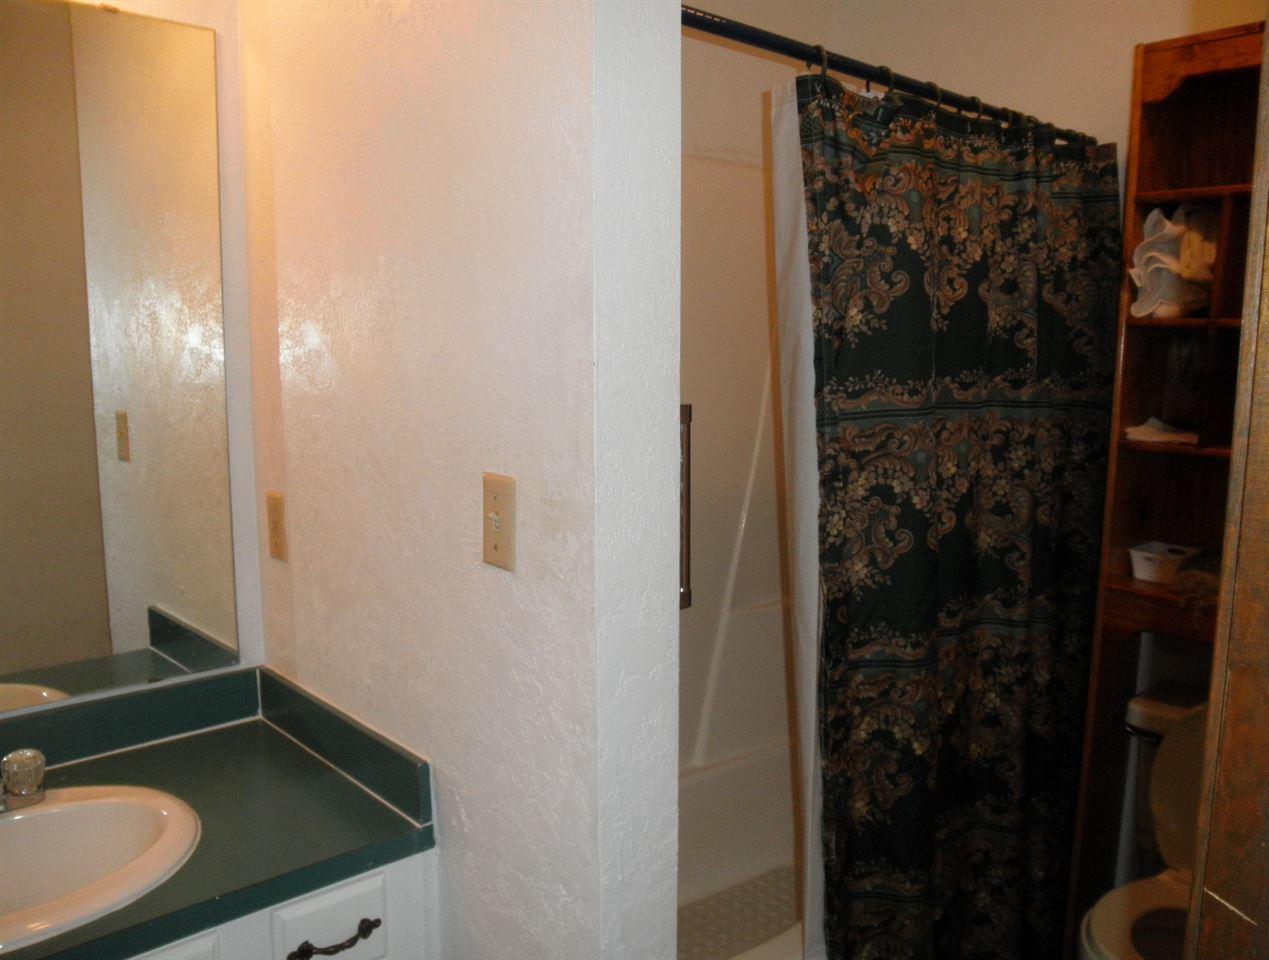 Sold Intraoffice W/MLS | 2520 Bonnie Ponca City, OK 74601 12